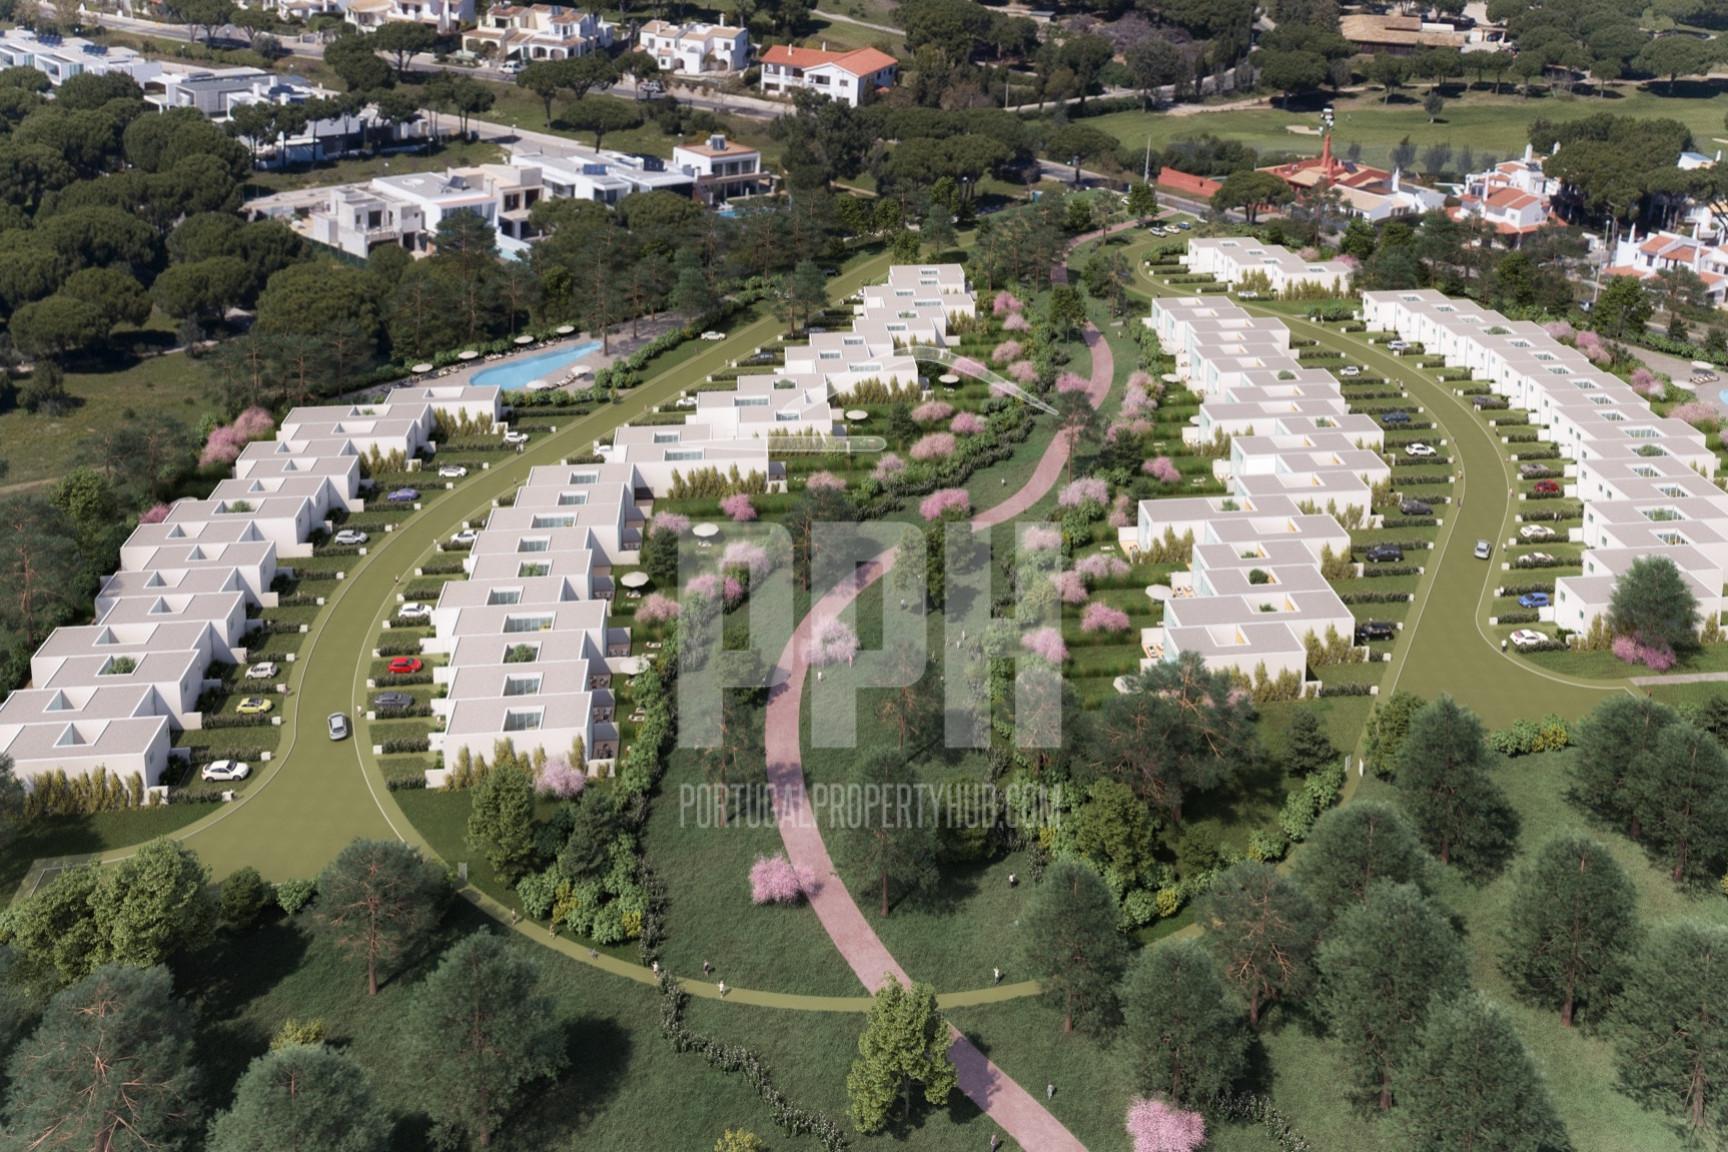 Modern 2 Bed Villa In Vilamoura Portugal Property Hub